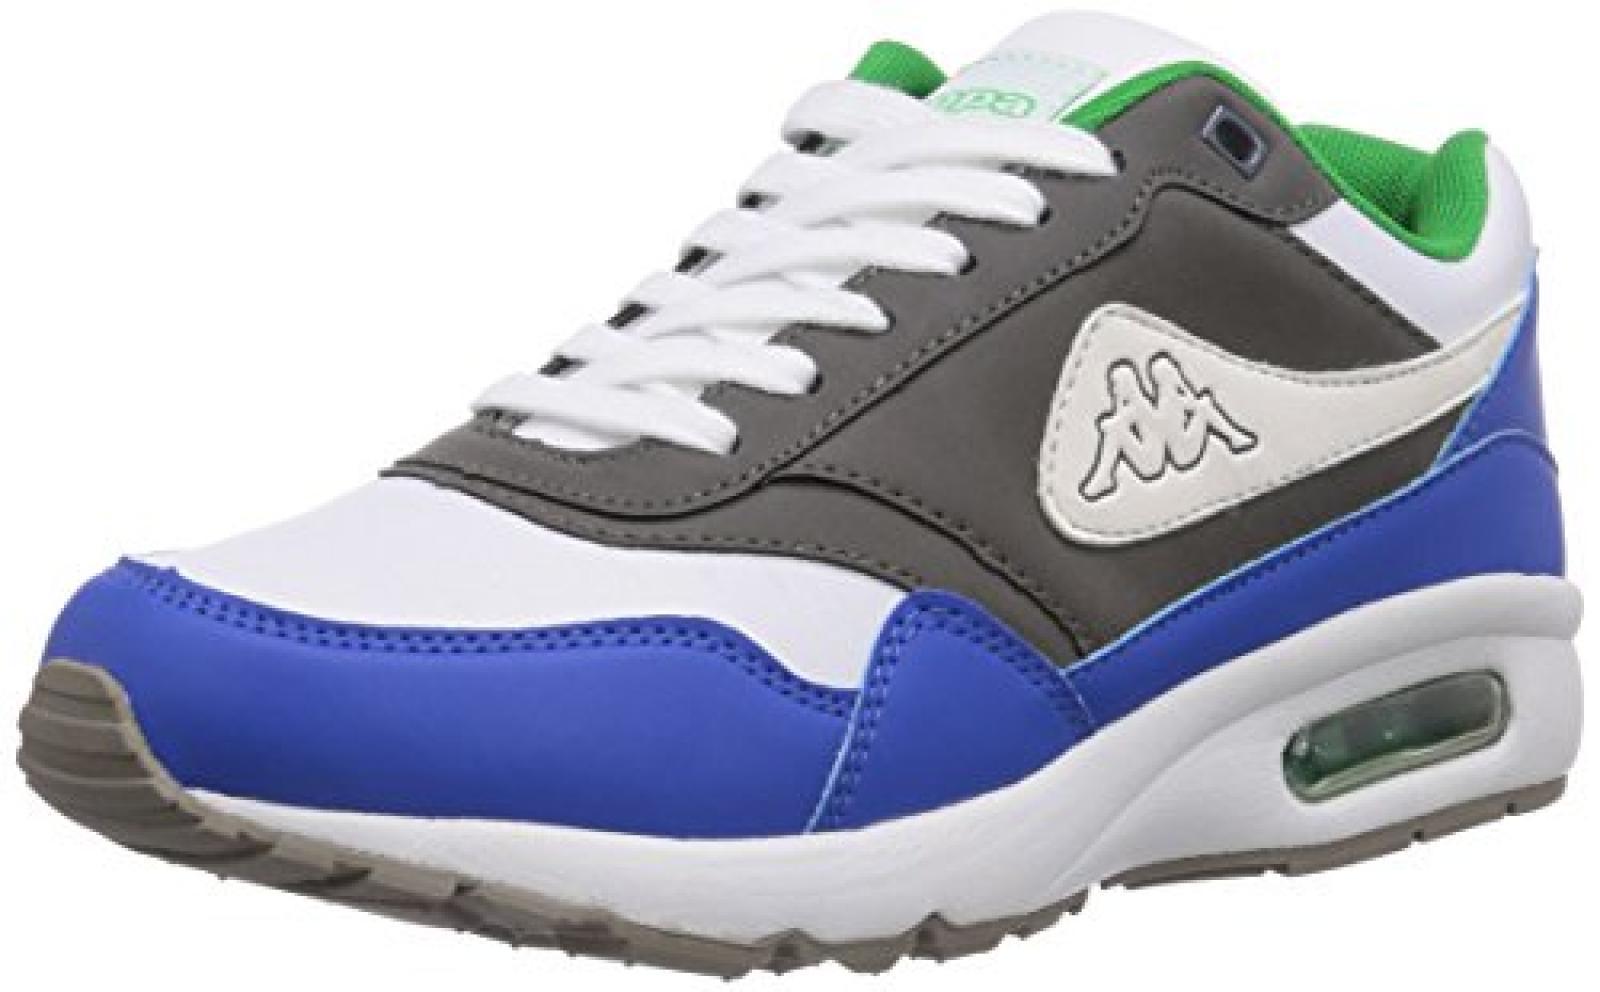 Kappa KONFEKT Footwear Unisex-Erwachsene Sneakers